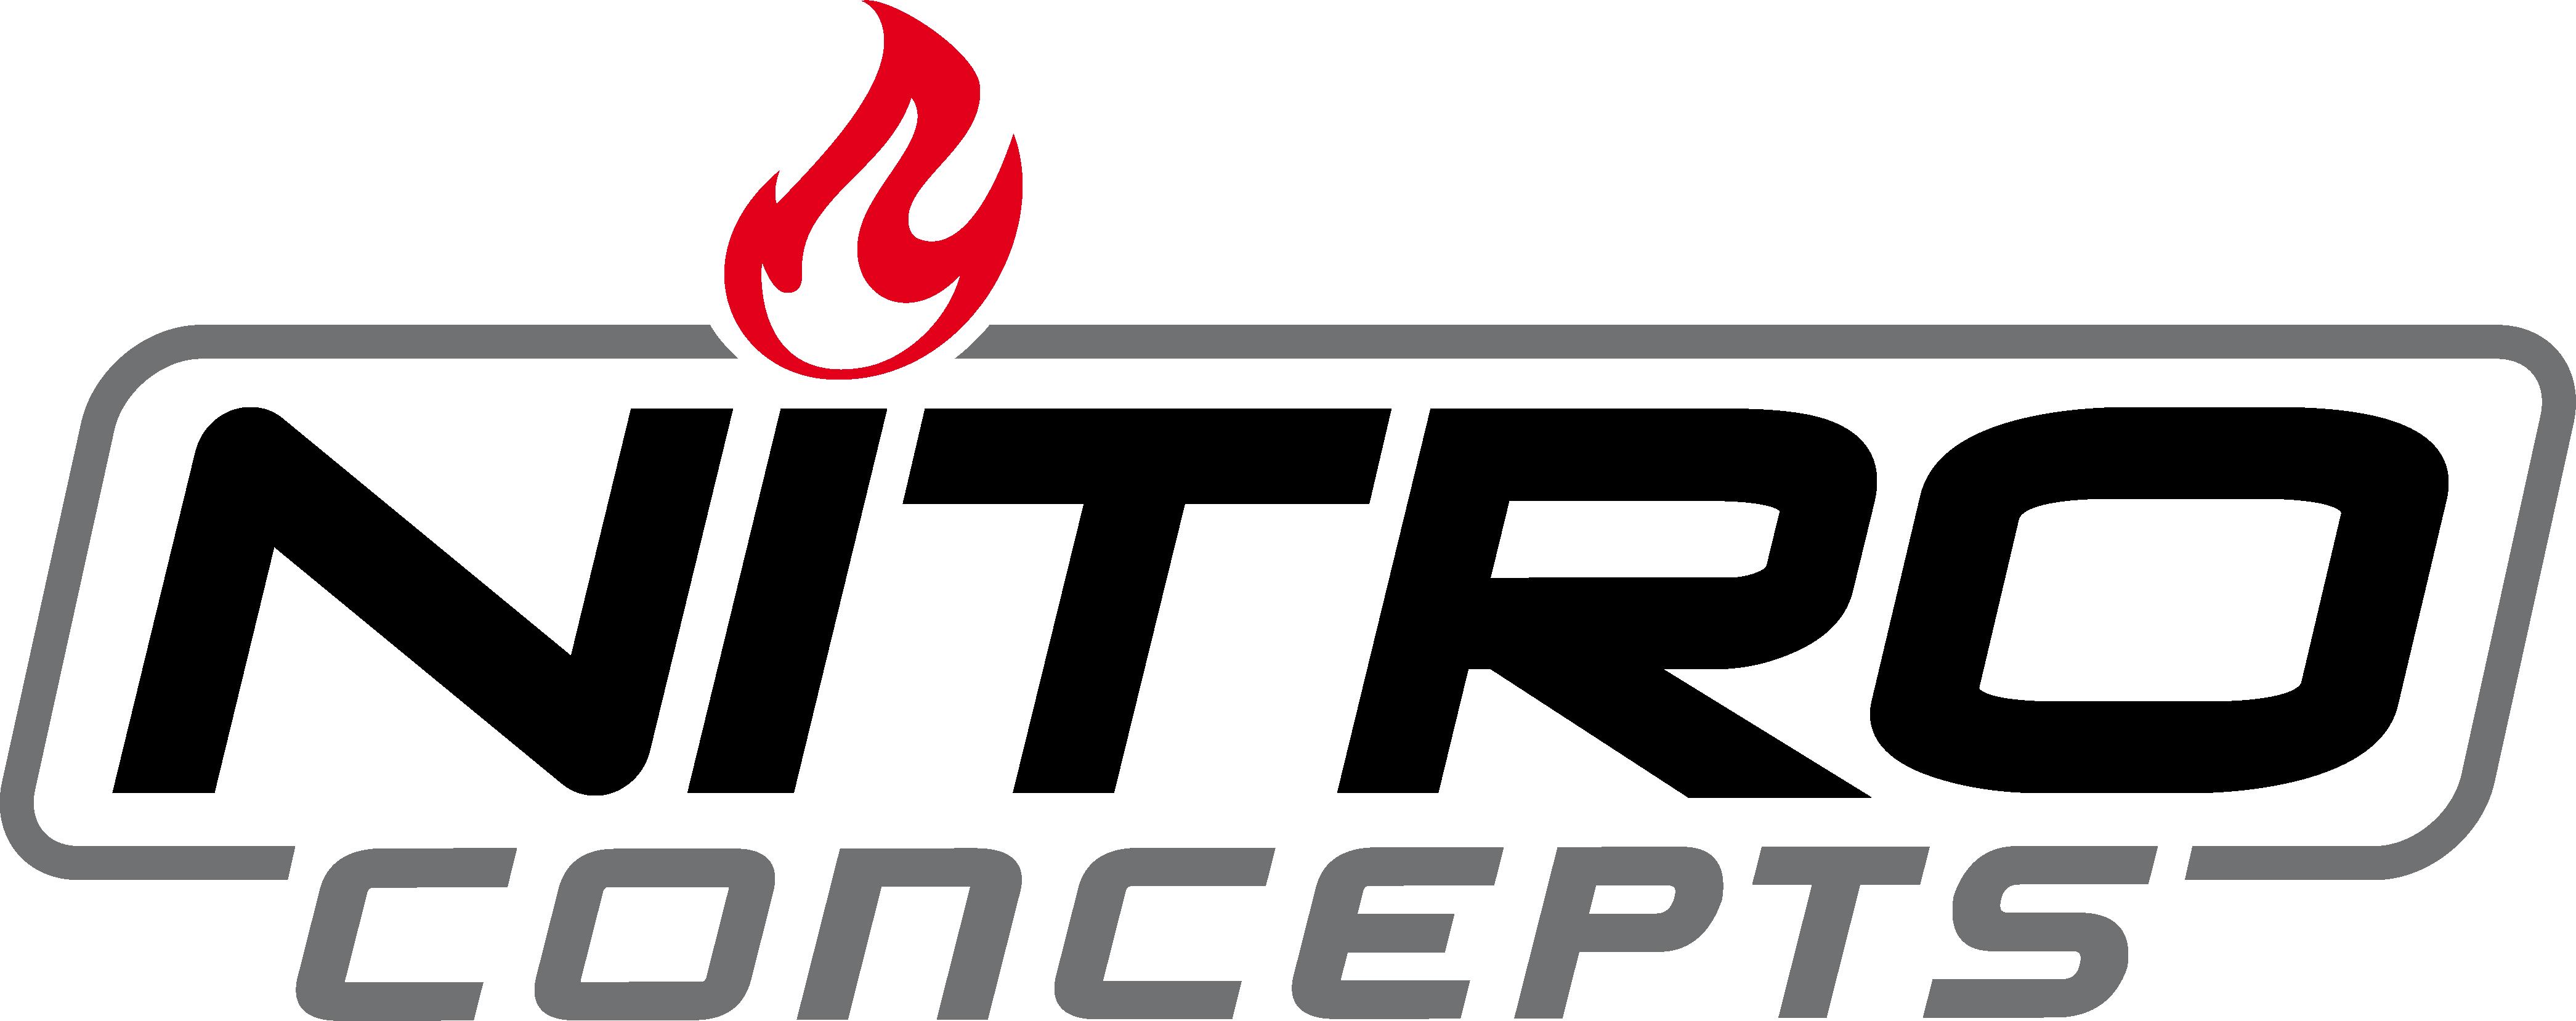 Nitro concepts logo black